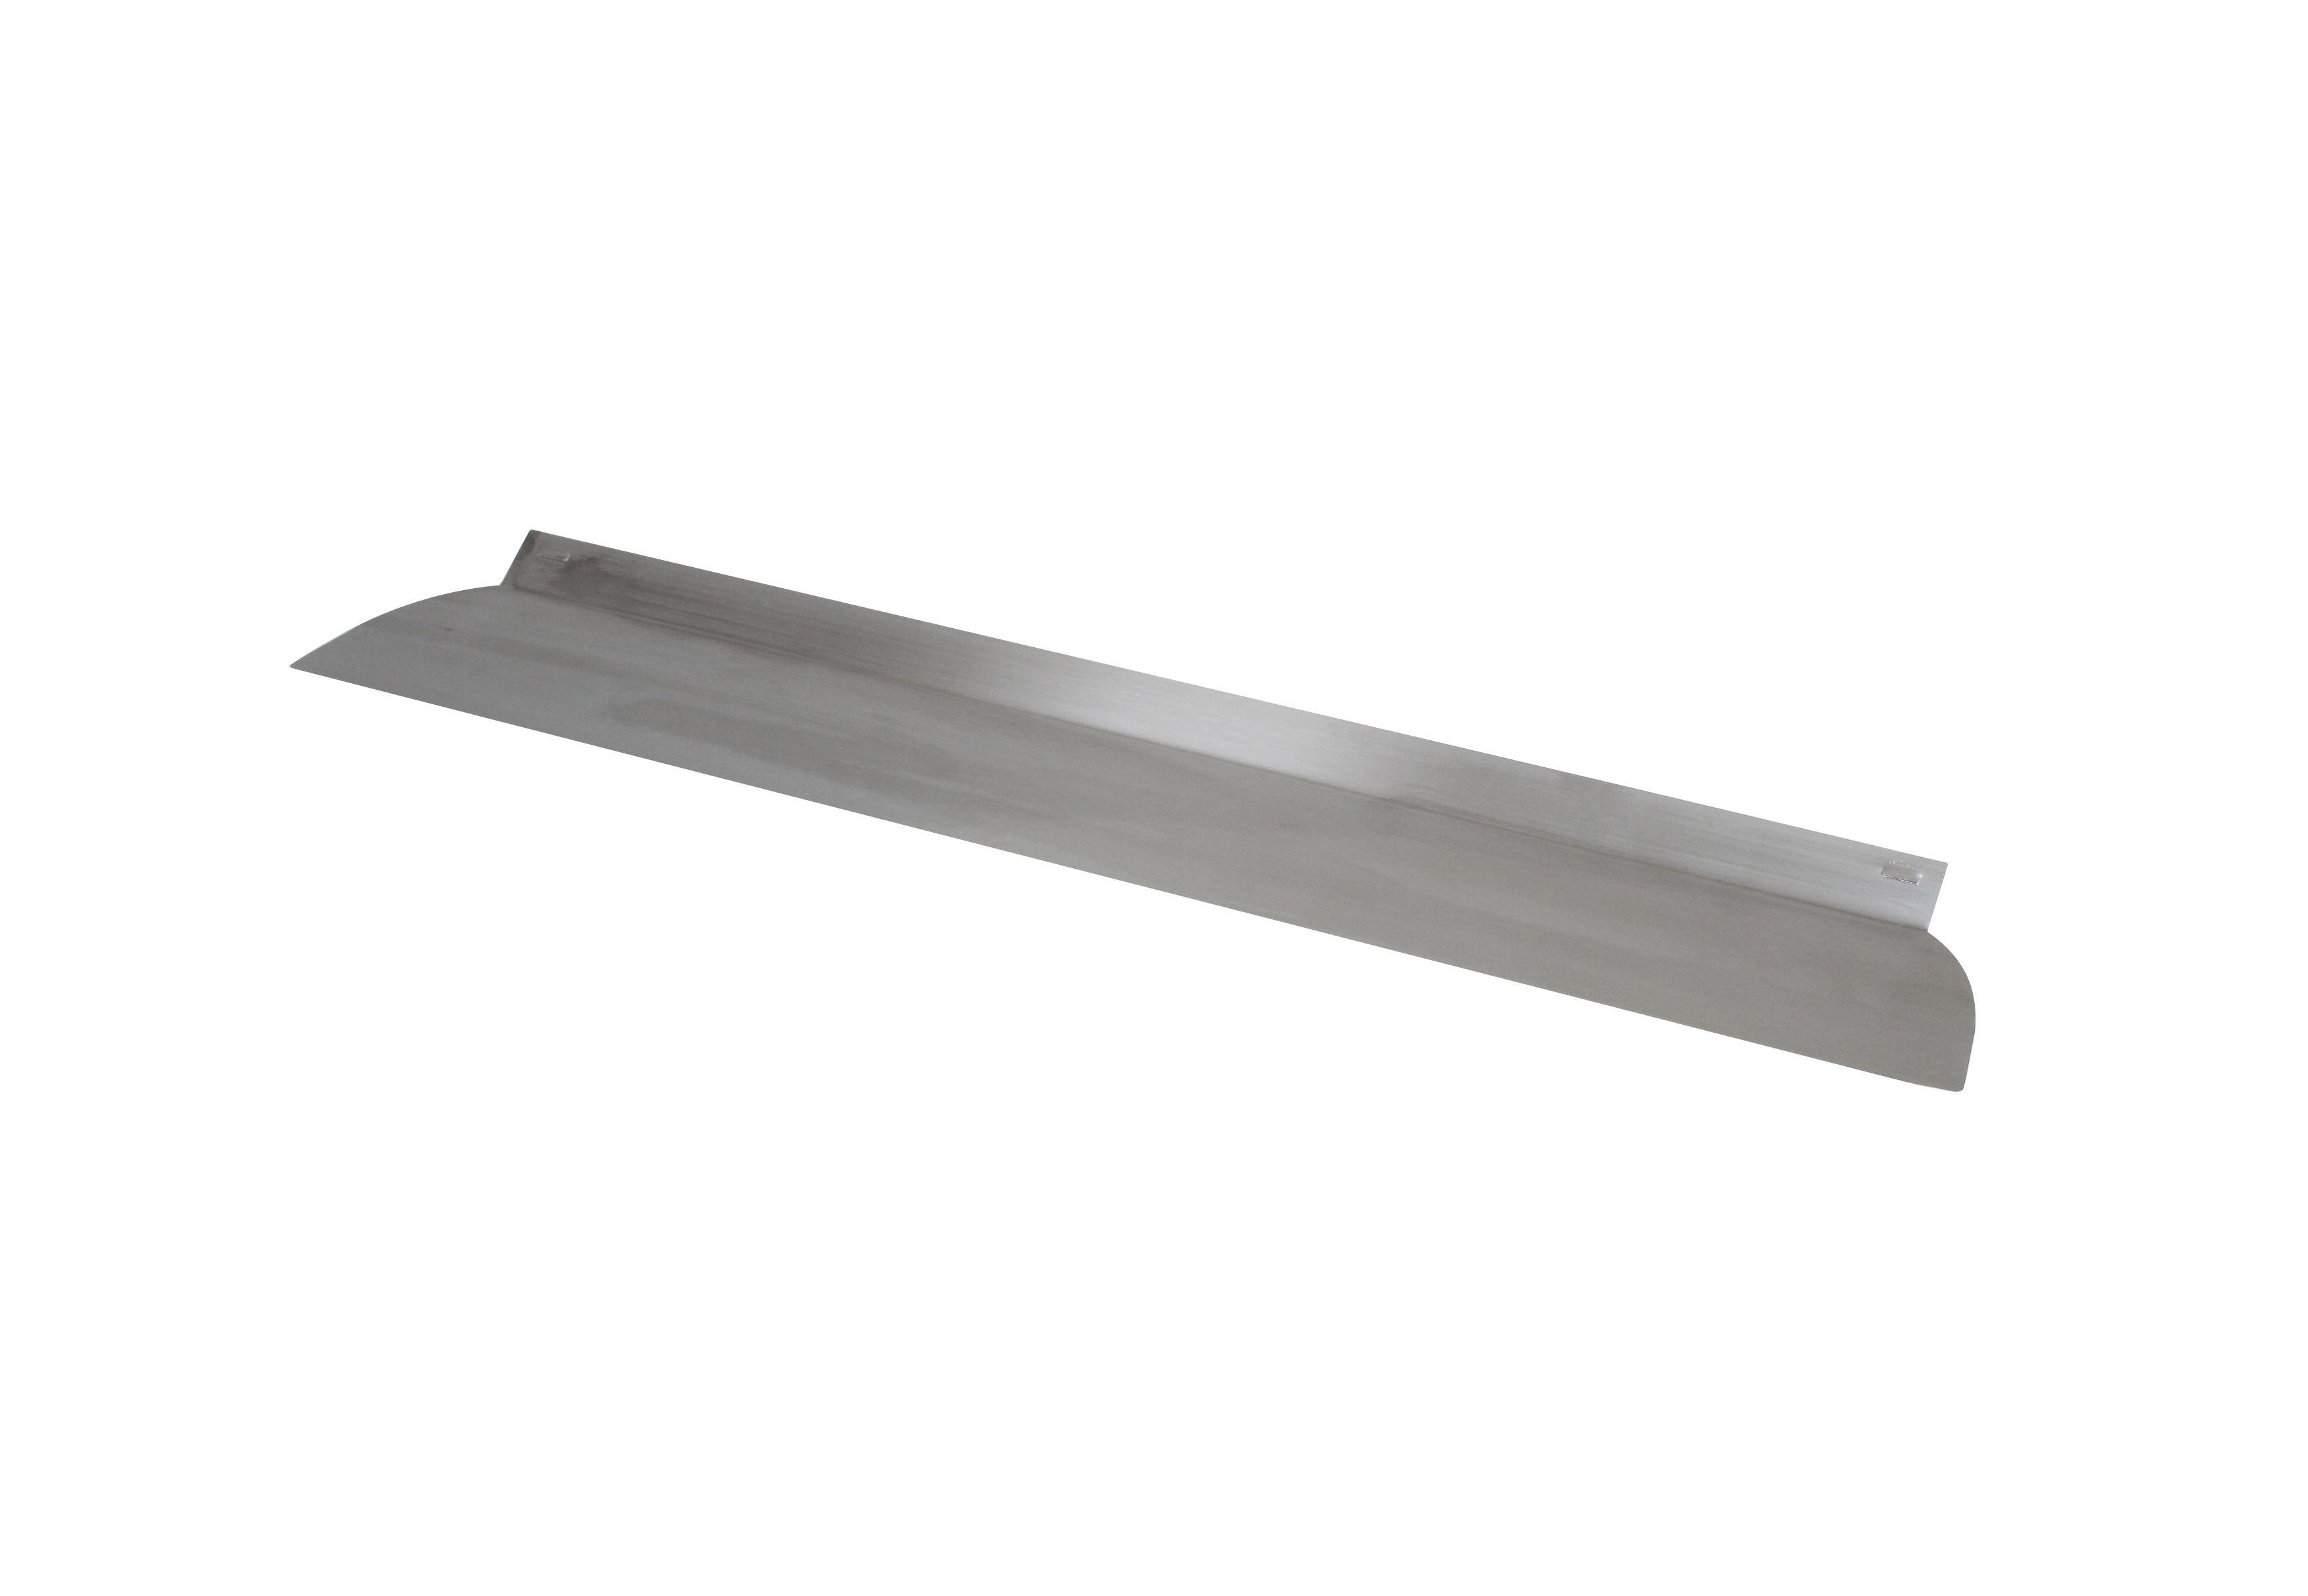 Ersatzblatt zu Profi-Flex-Spachtel 600 mm ( Nr. 0627 )